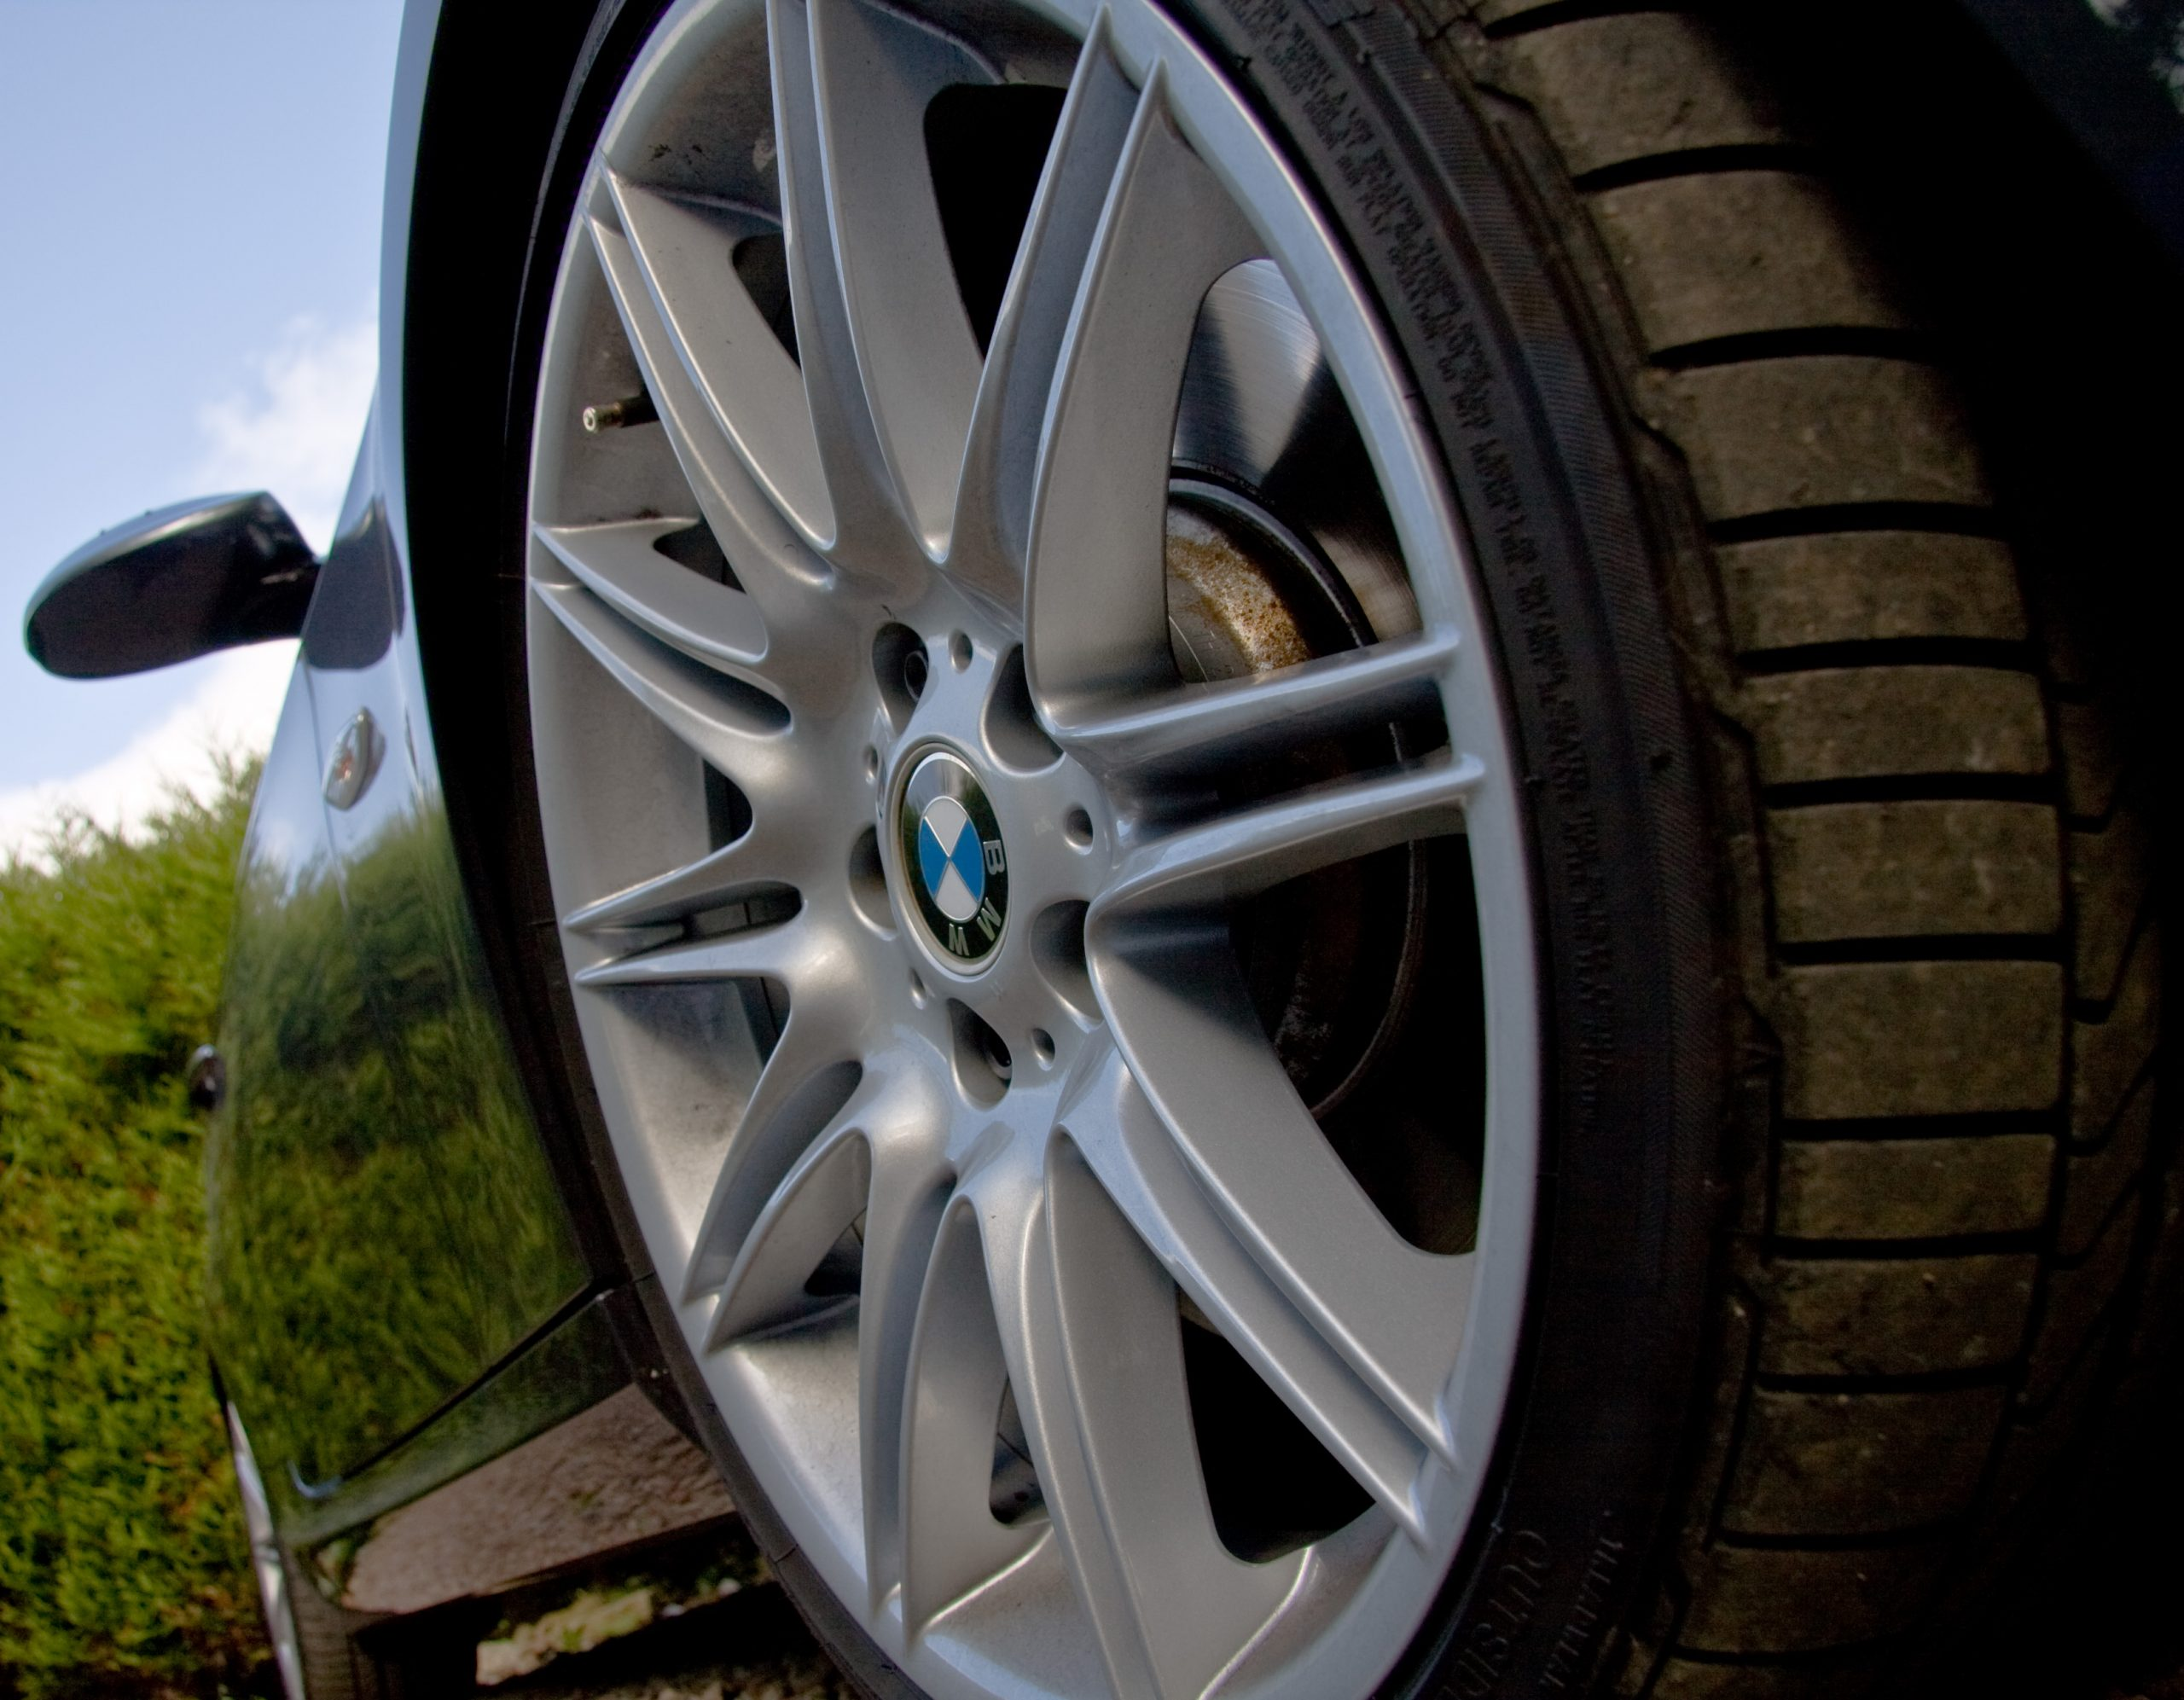 A quoi sert l'indice de charge de pneu ?